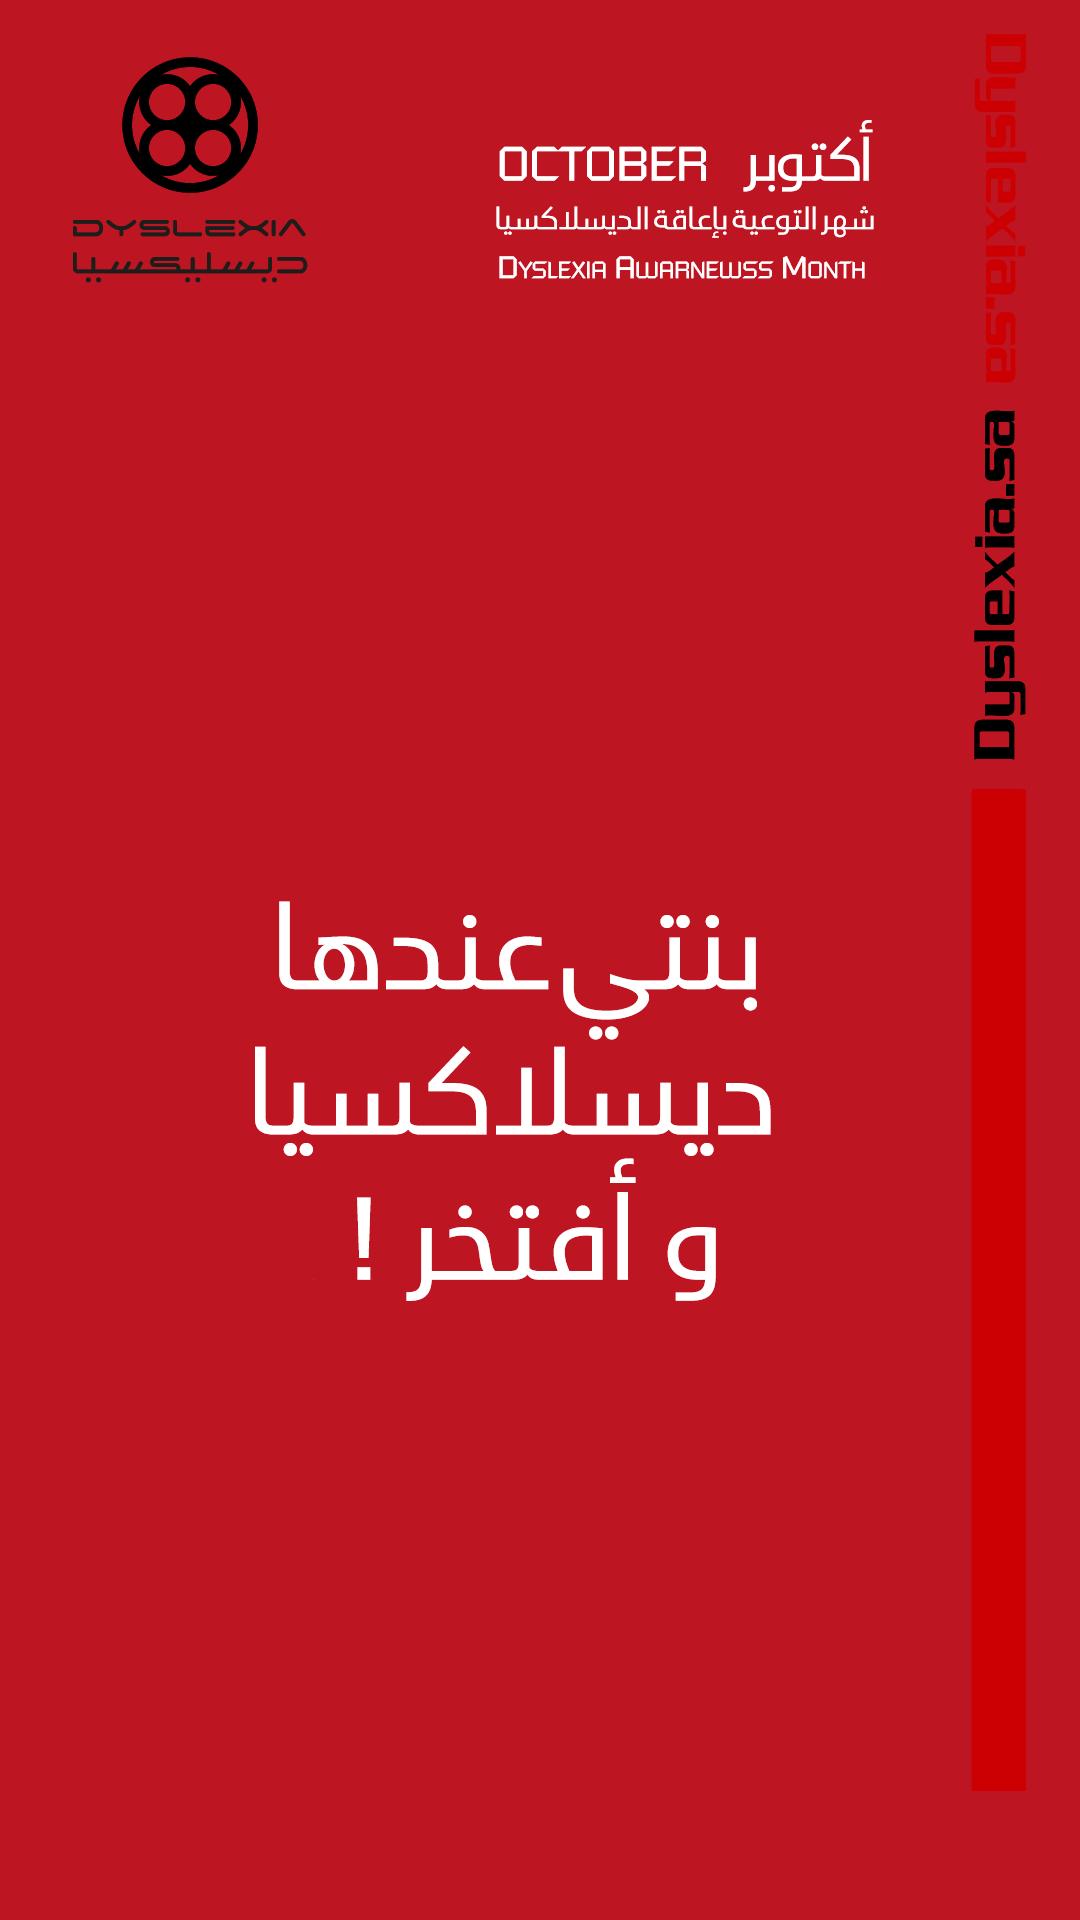 dyslexia-geofilter-may-3rd9